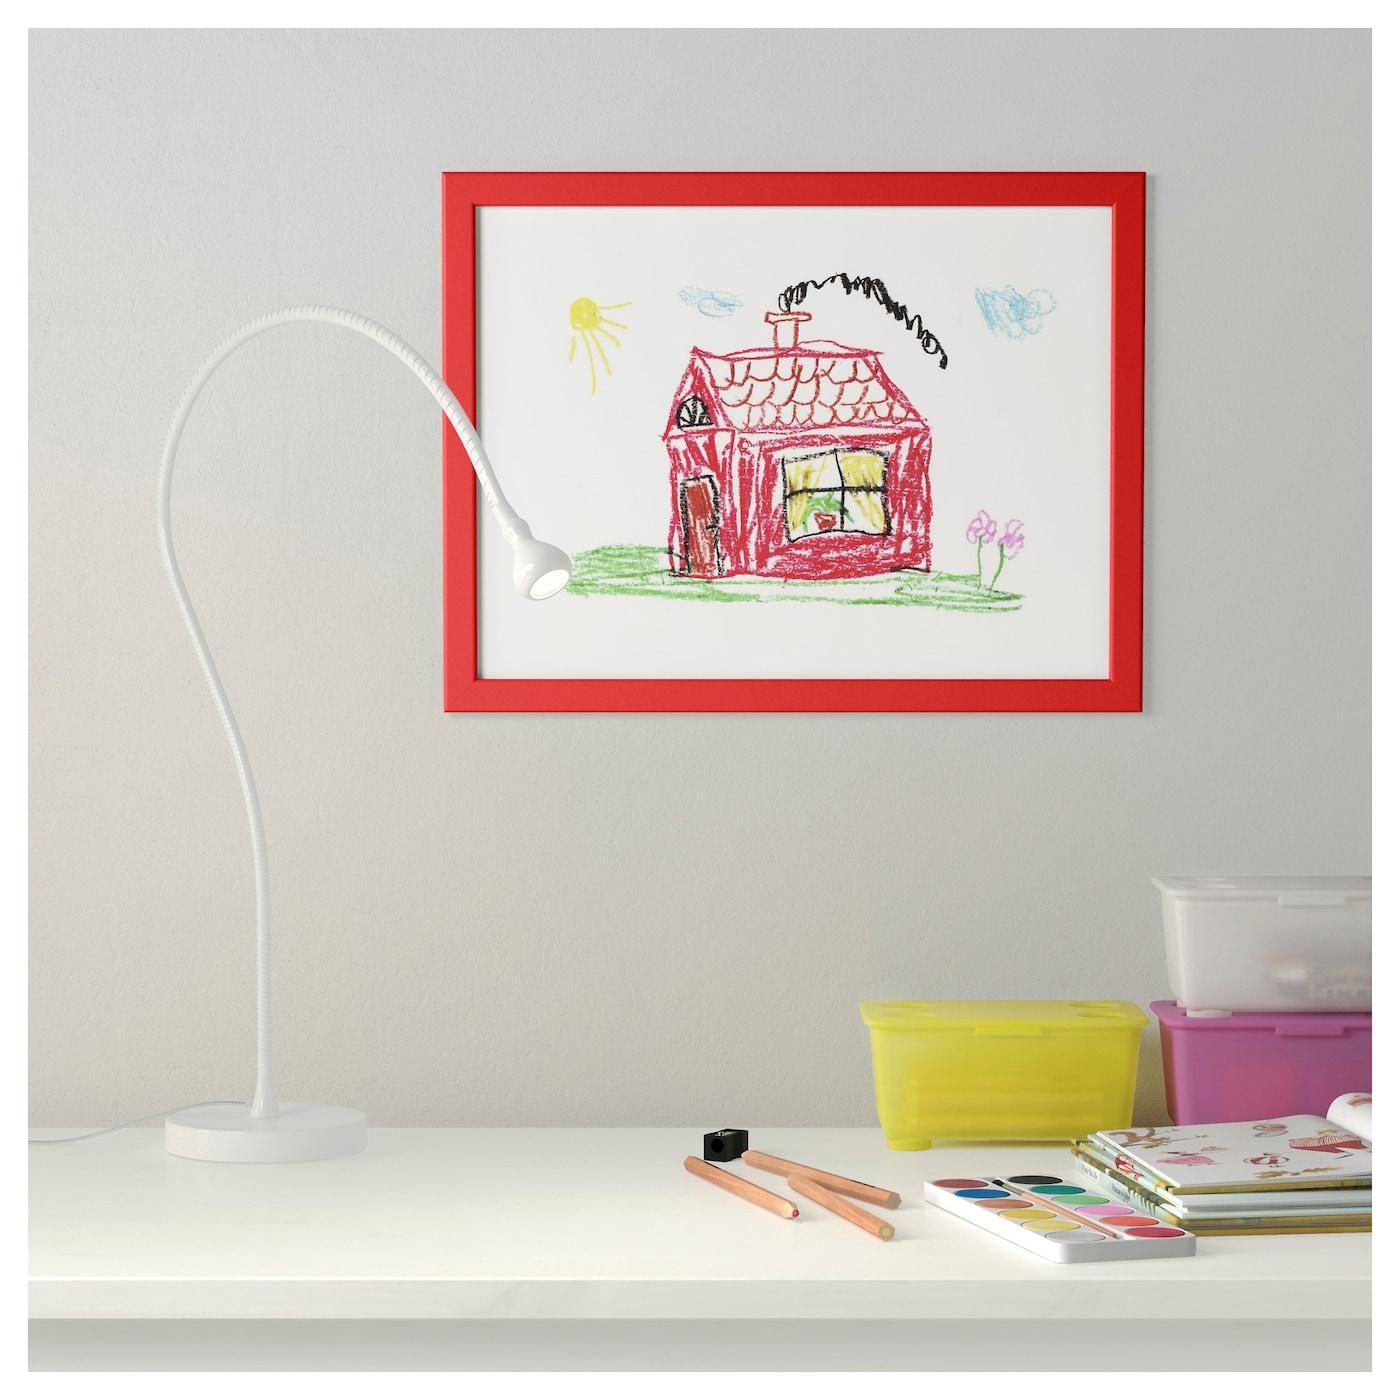 Photo Frames - Picture Frames & Multi Photo Frames | IKEA